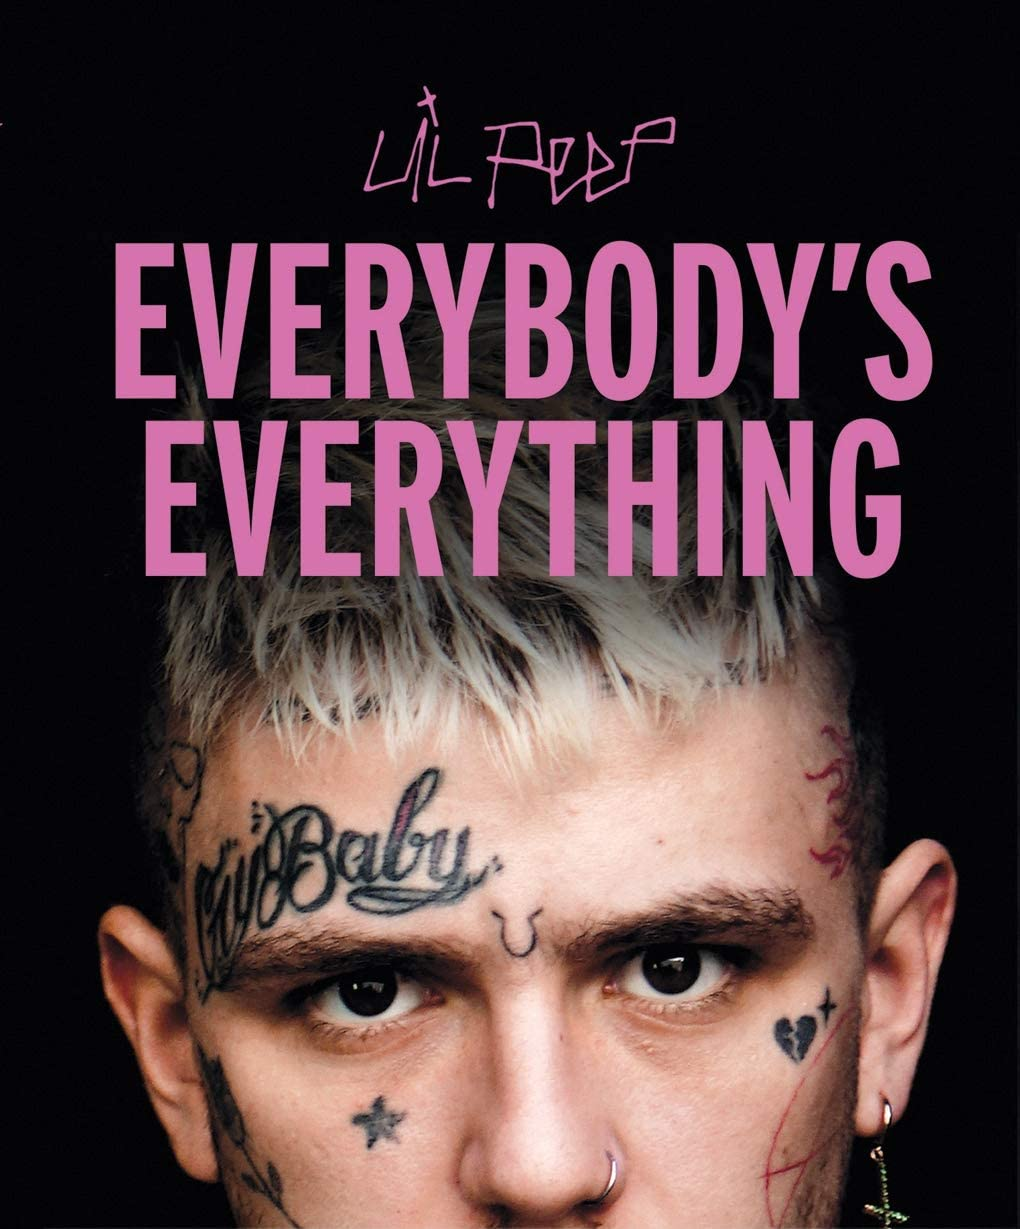 Everybodys Everything